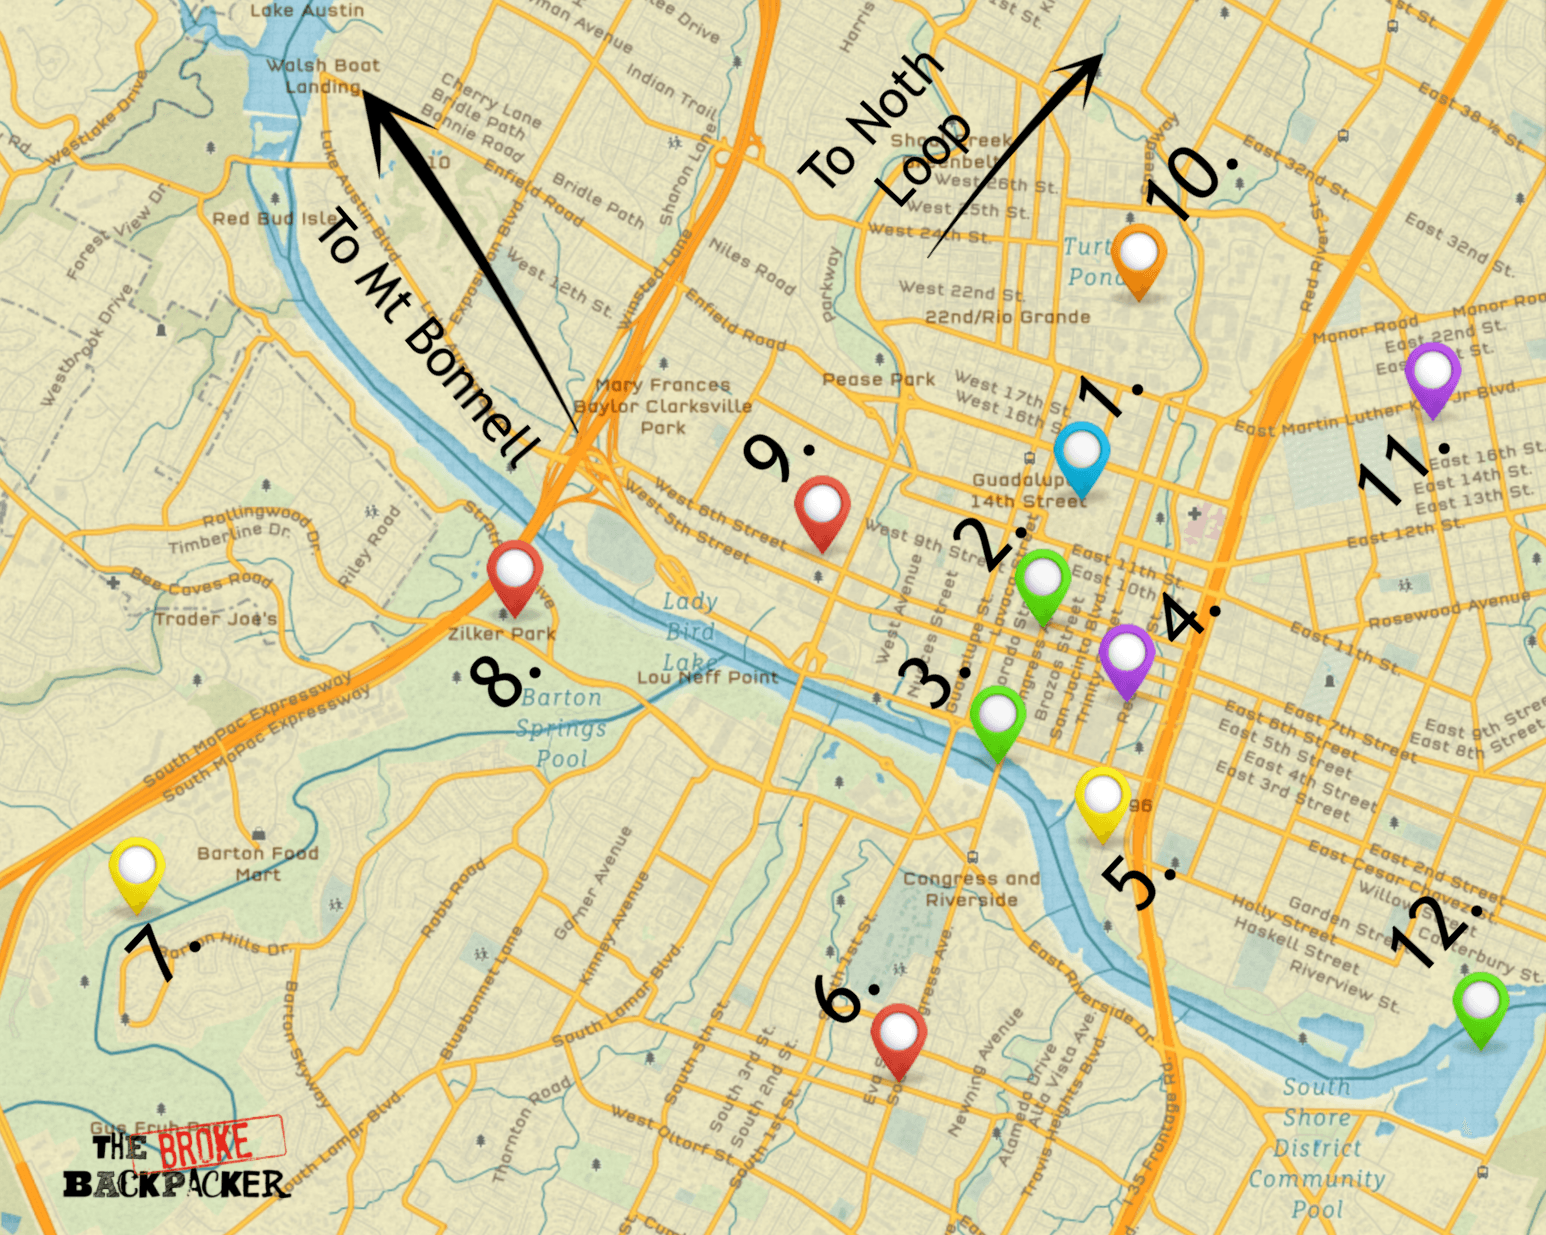 map of austin itinerary